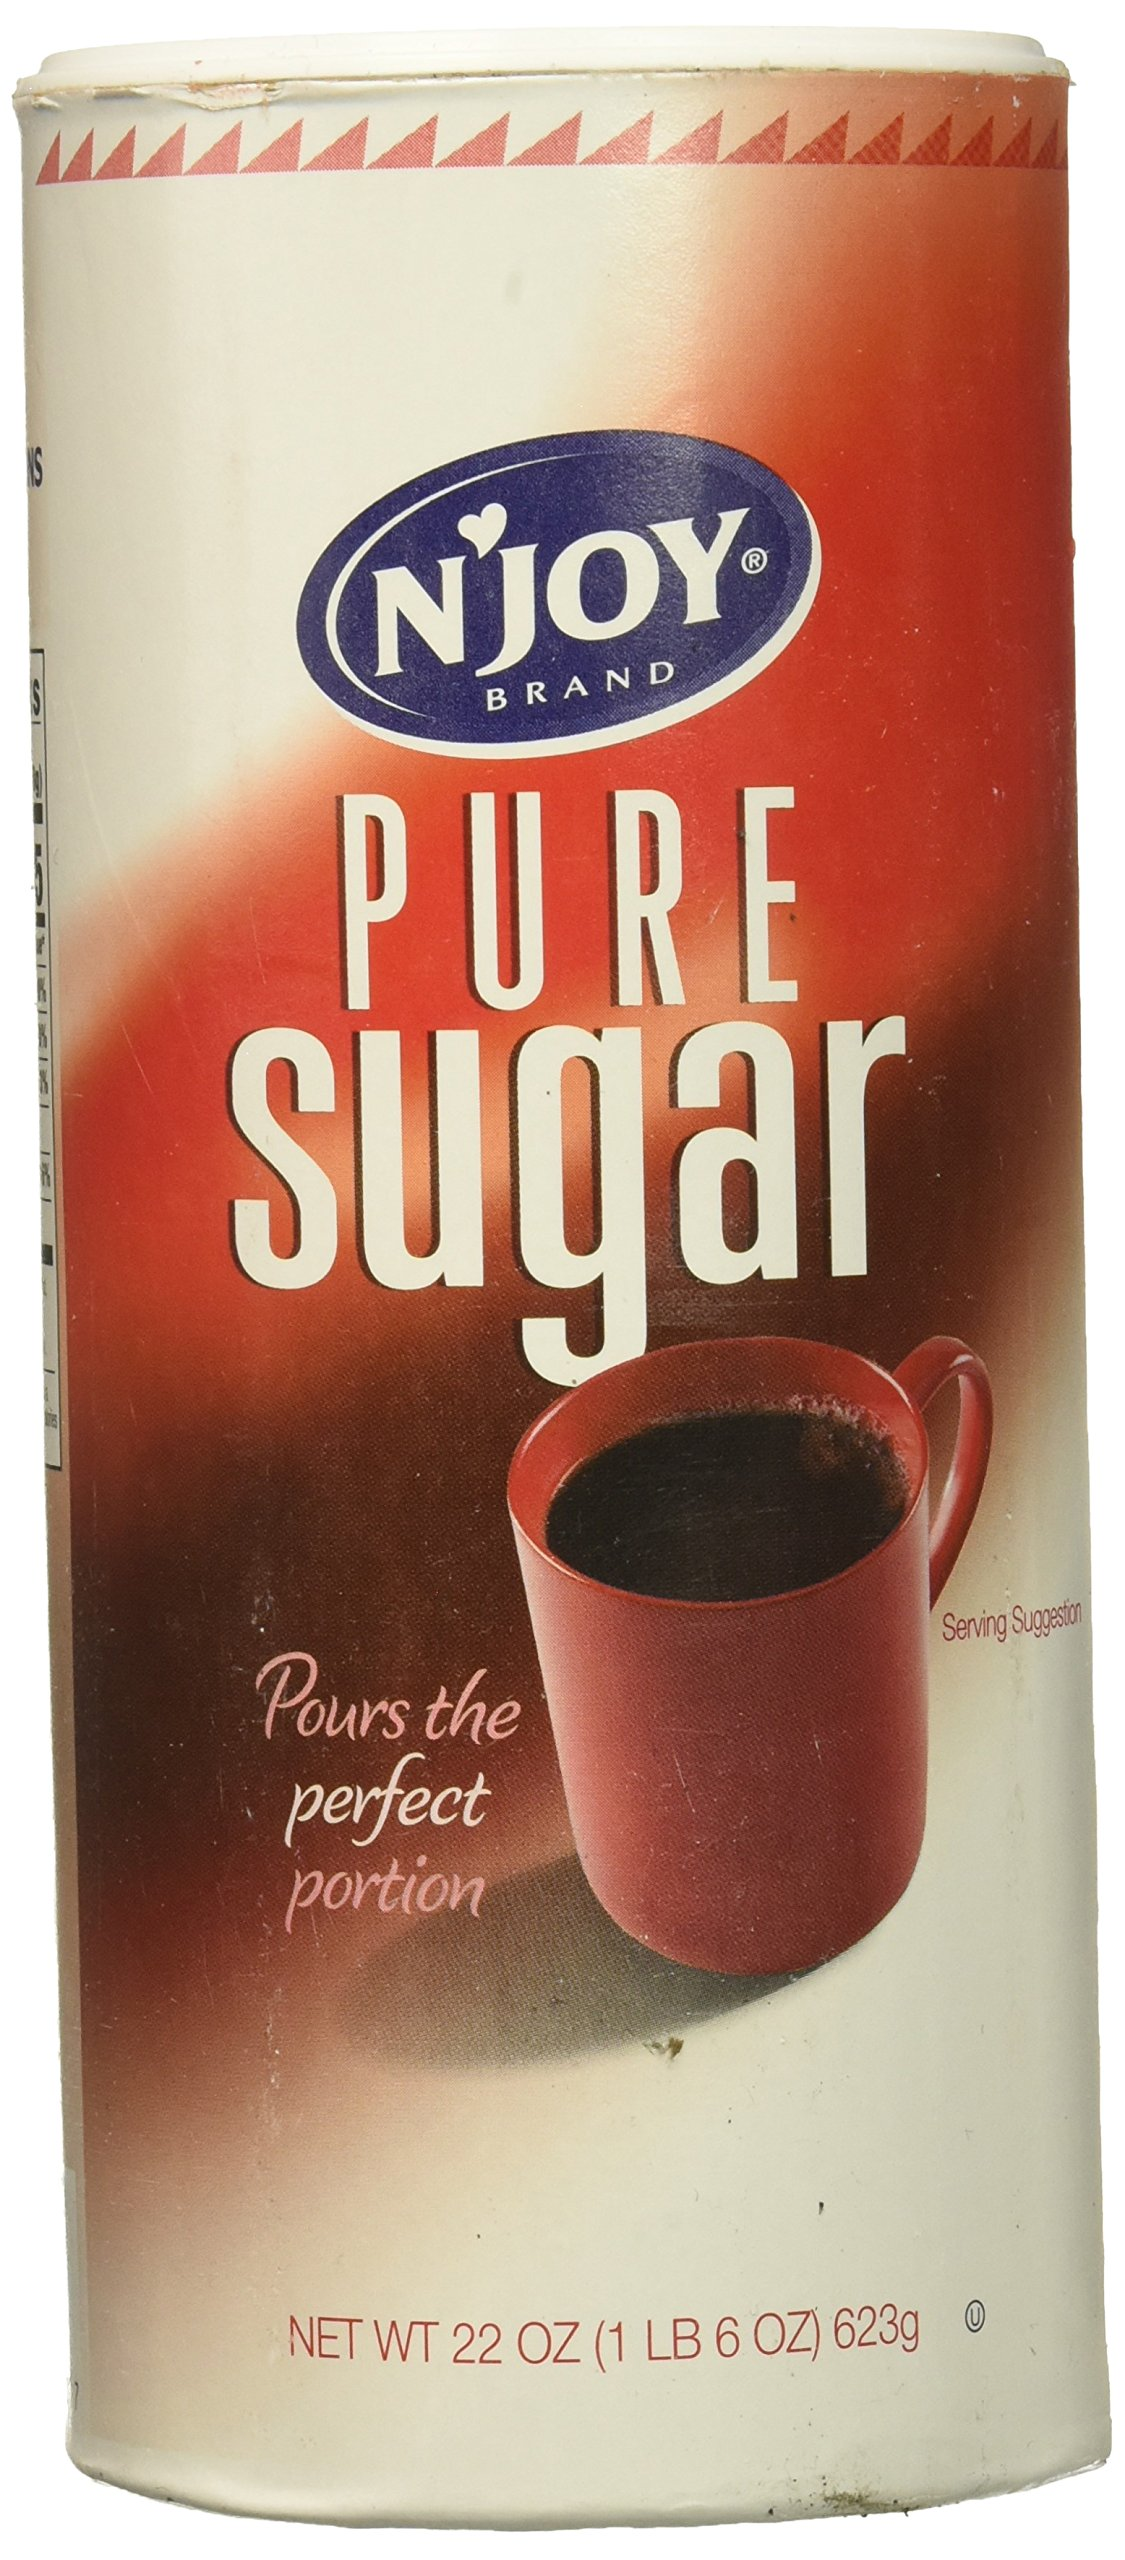 N'JOY Pure Cane Sugar,  22 oz. Canisters (Pack of 8) by N'Joy